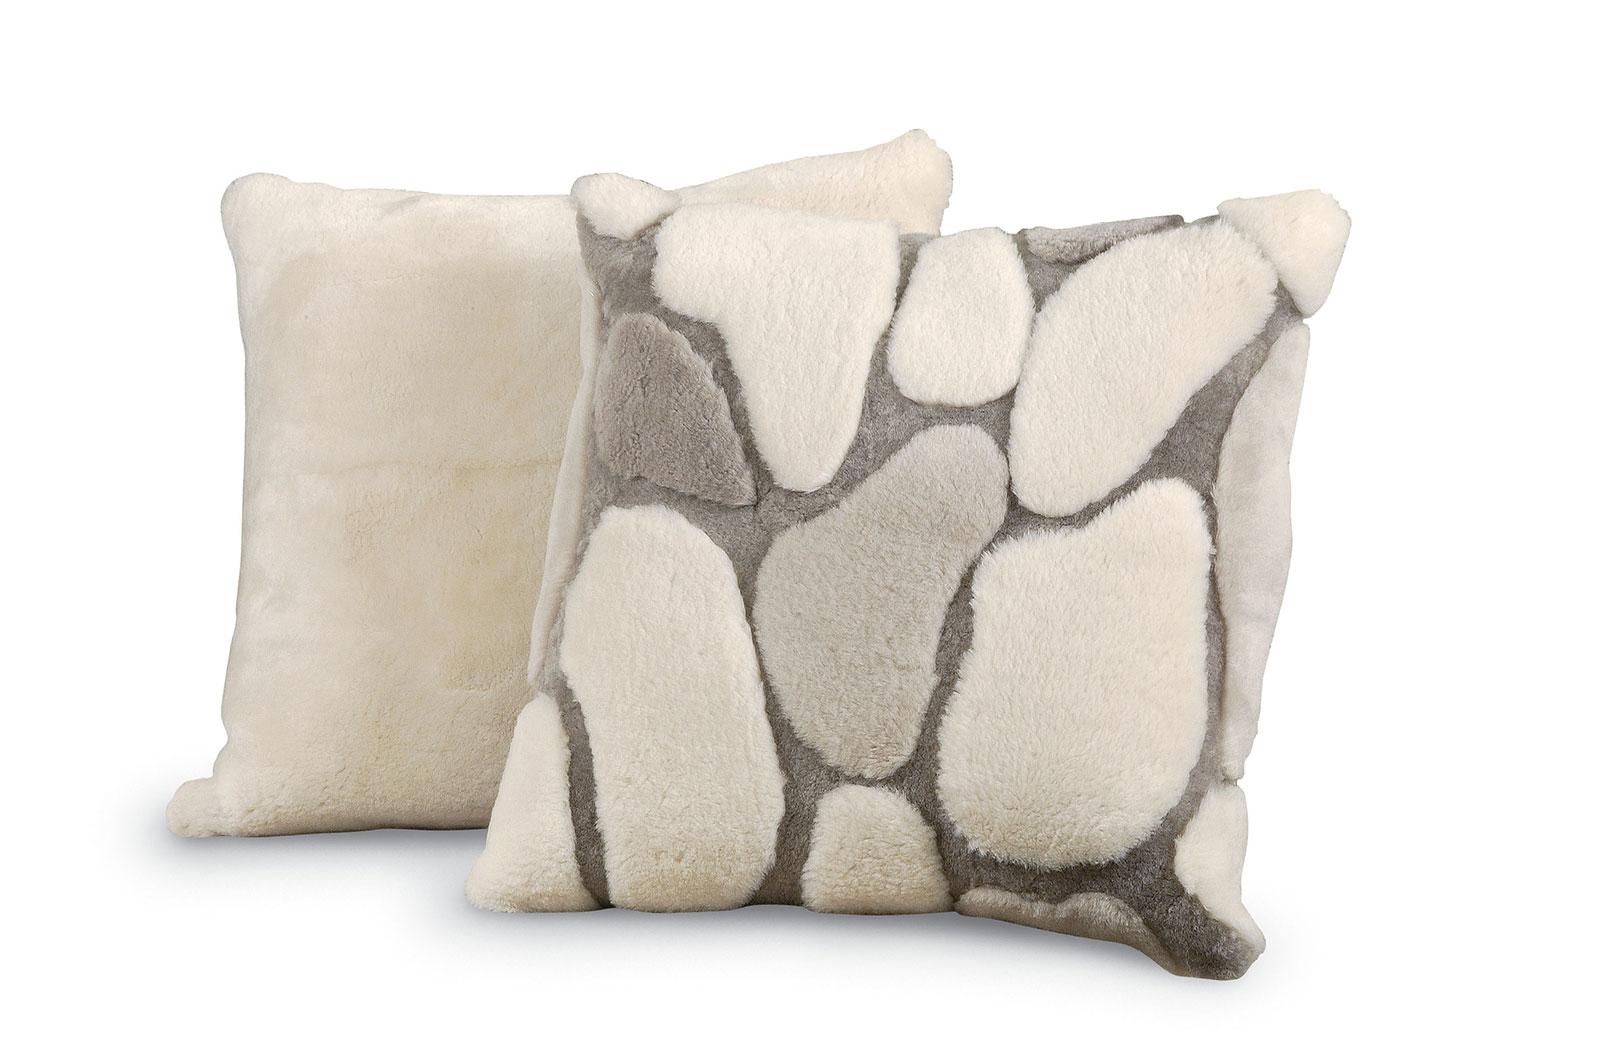 Shearling Designer Pillows